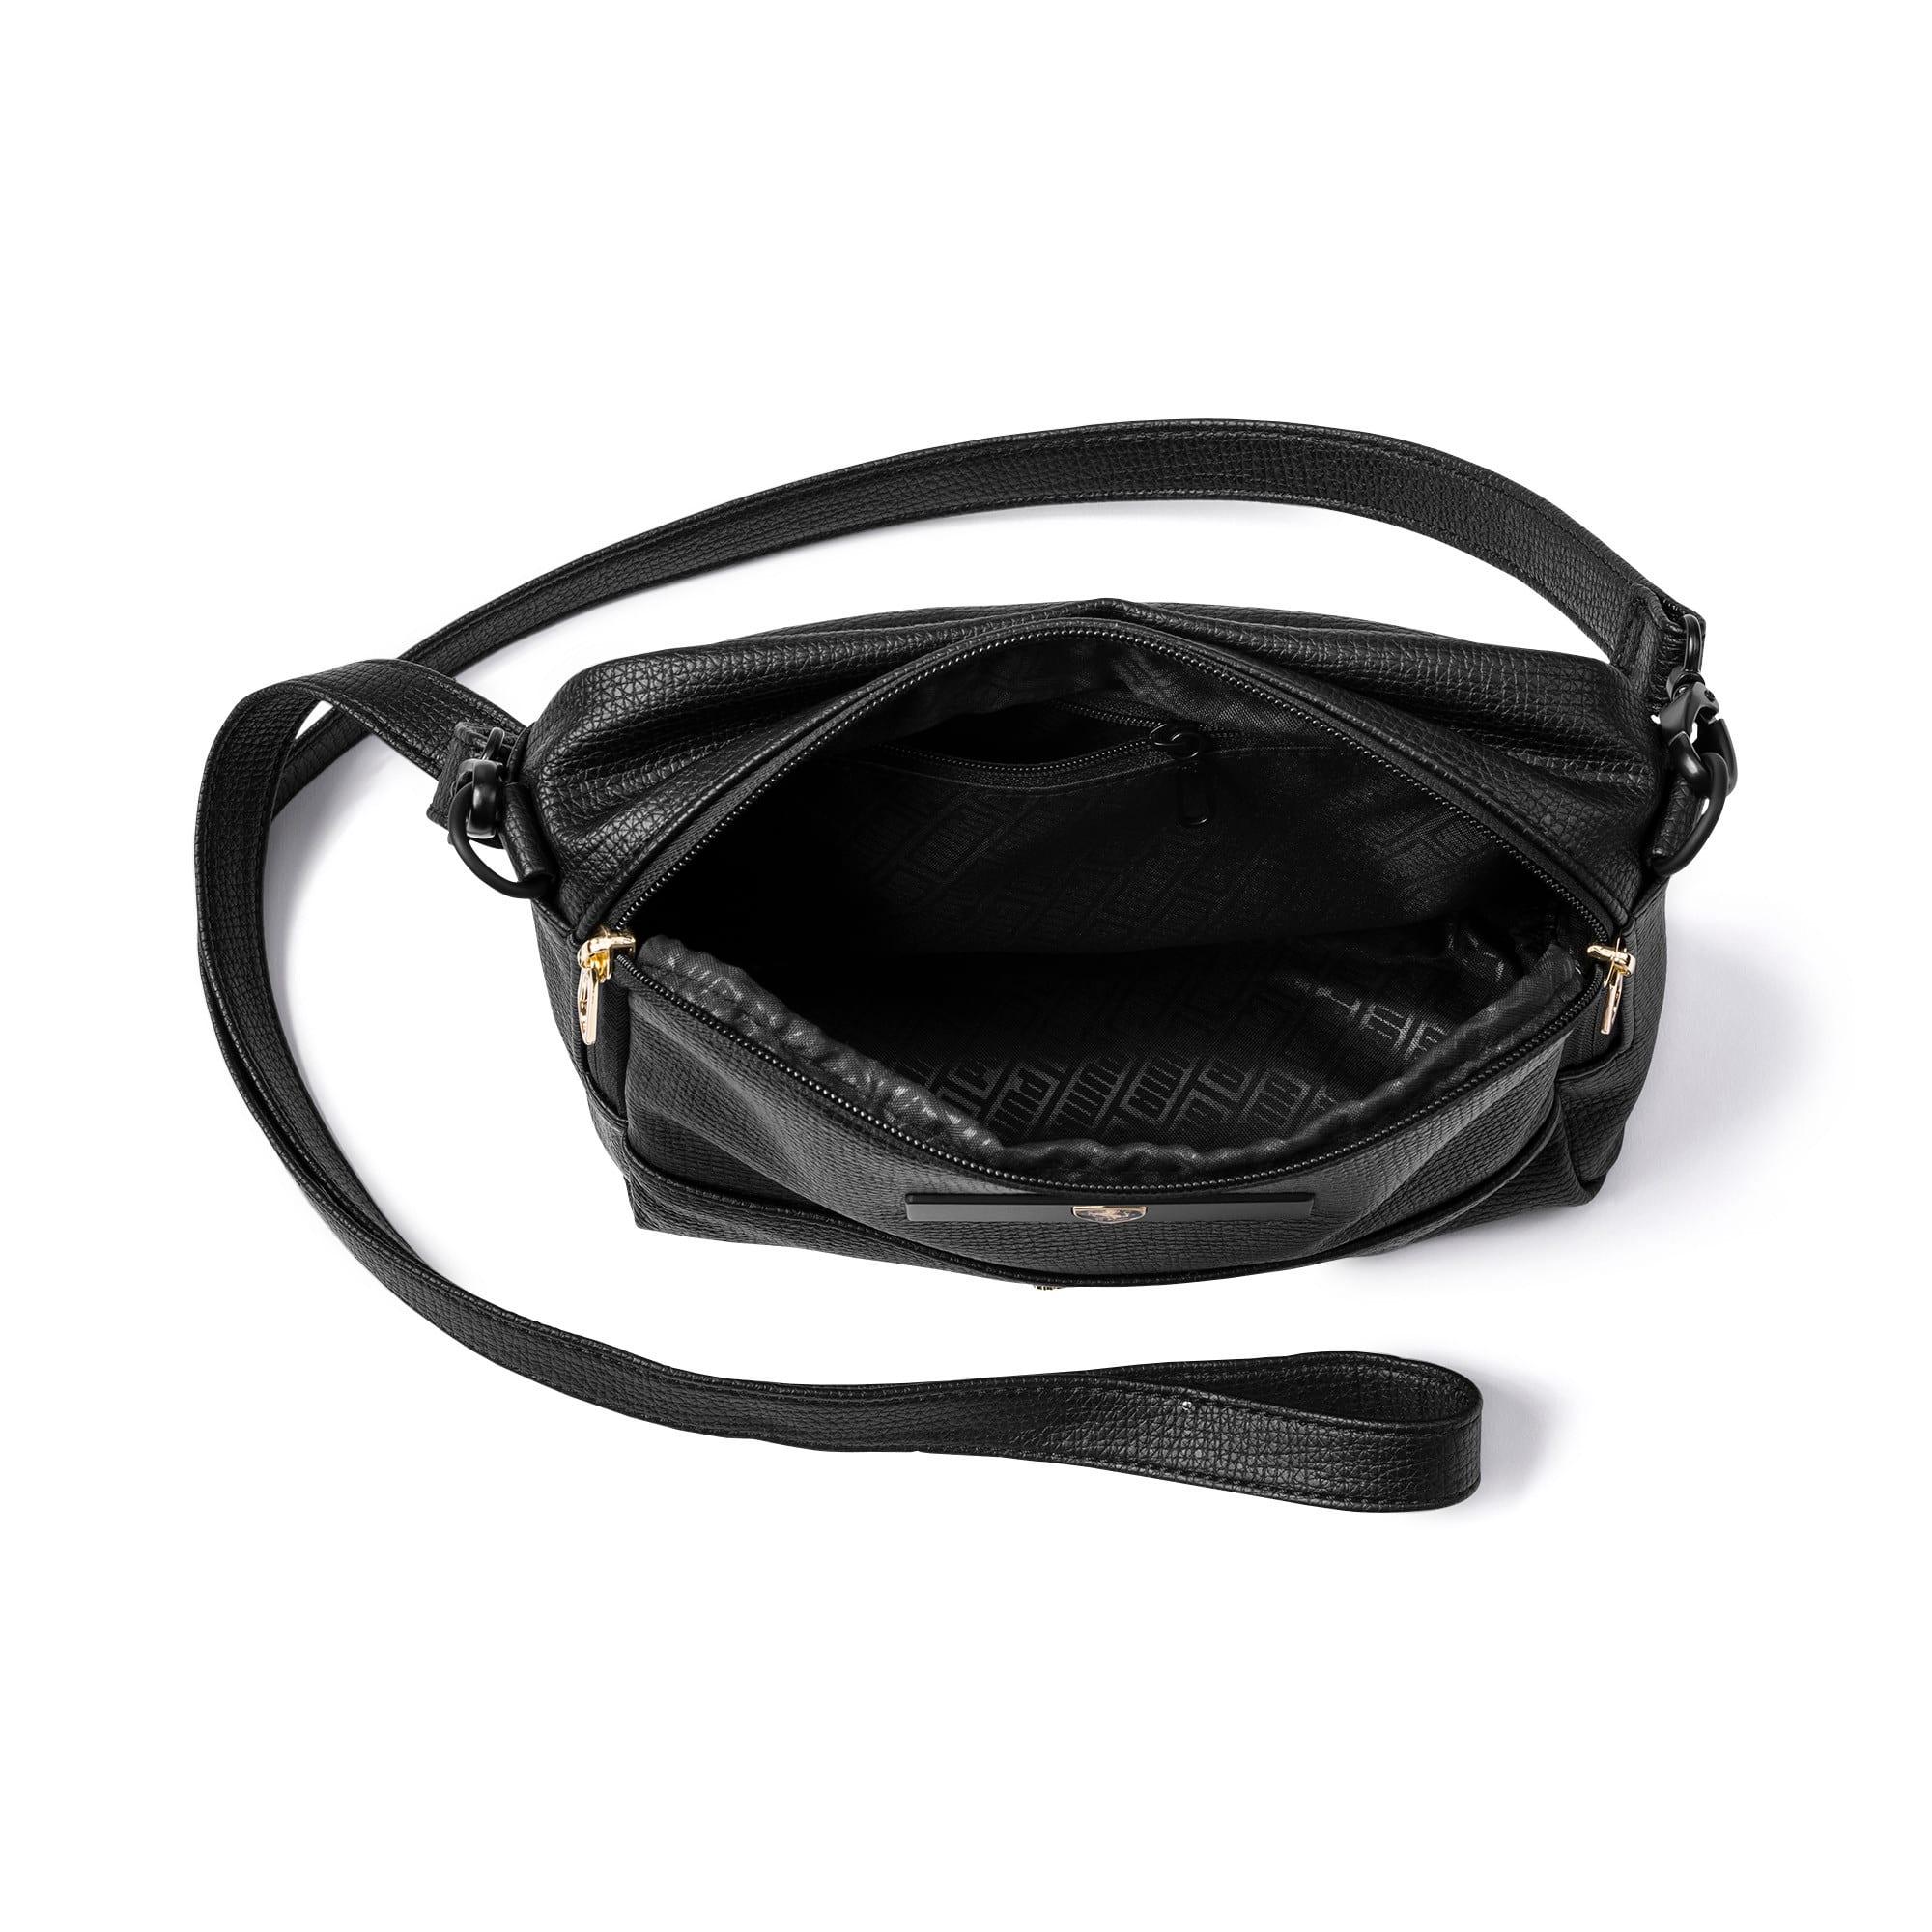 Thumbnail 4 of PUMA x Ferrari Mini Women's handbag, Puma Black, medium-IND